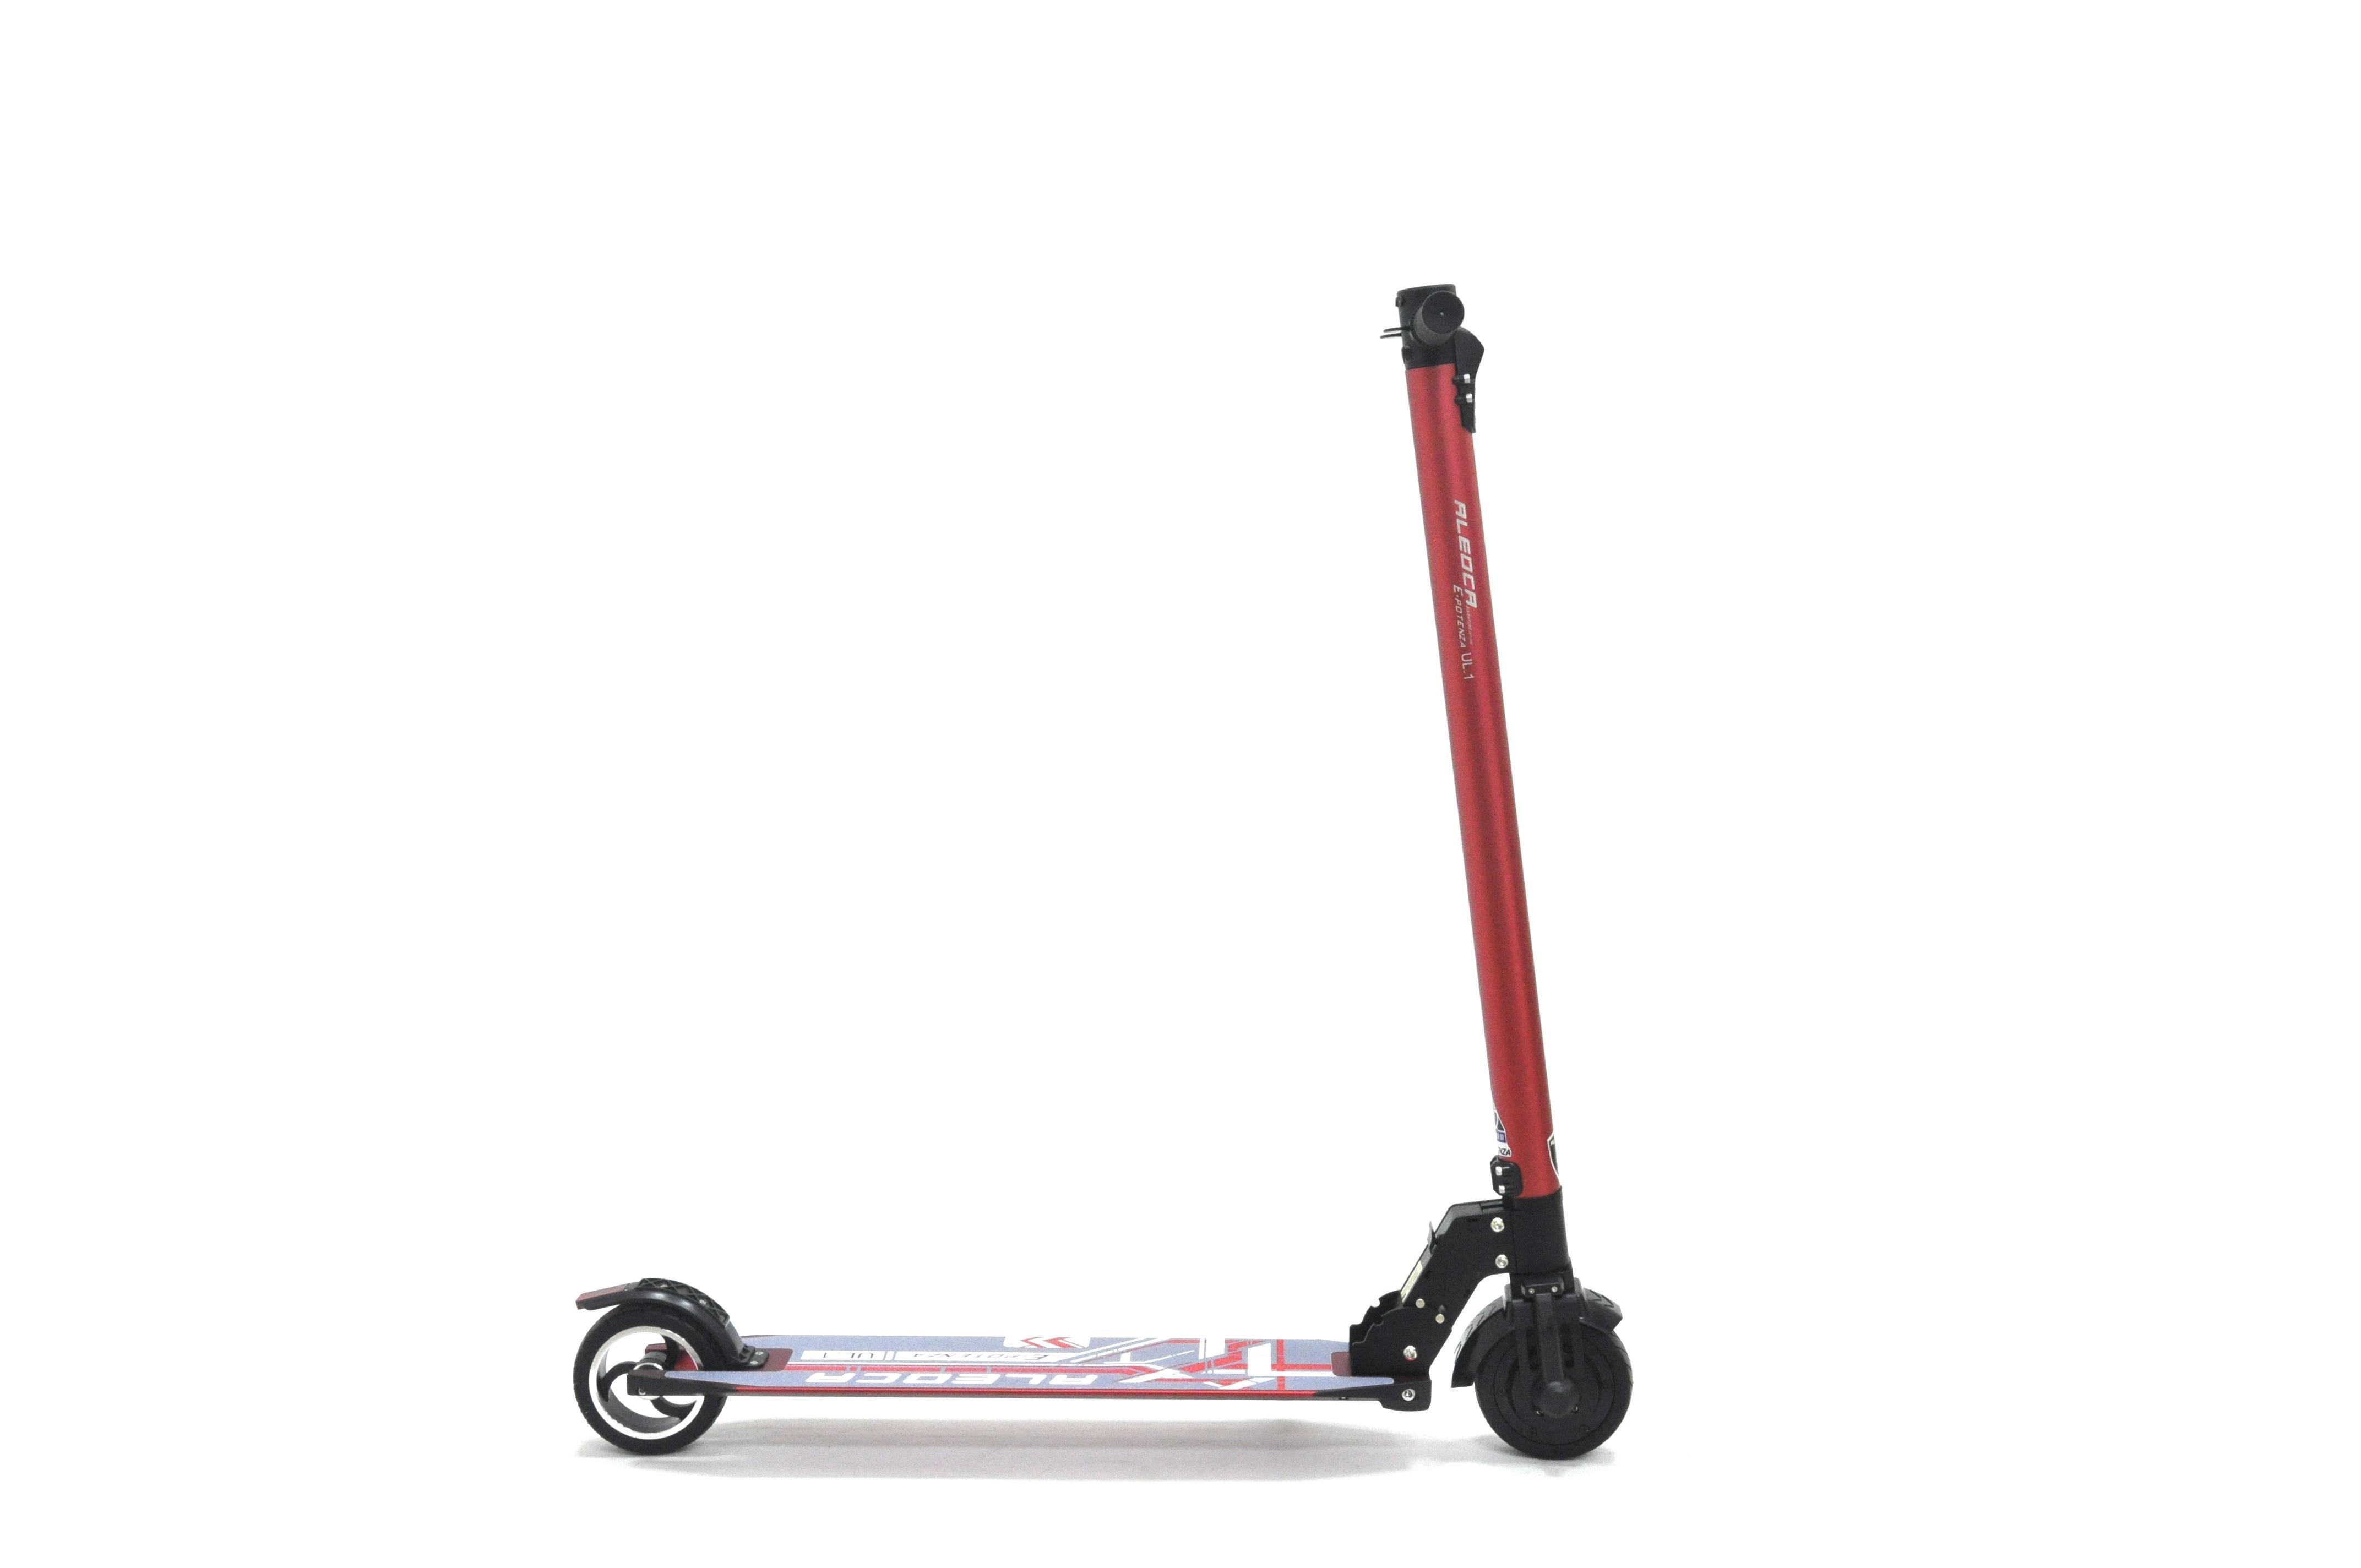 Aleoca E-Potenza Alloy Electric Scooter U2272 LTA Compliant